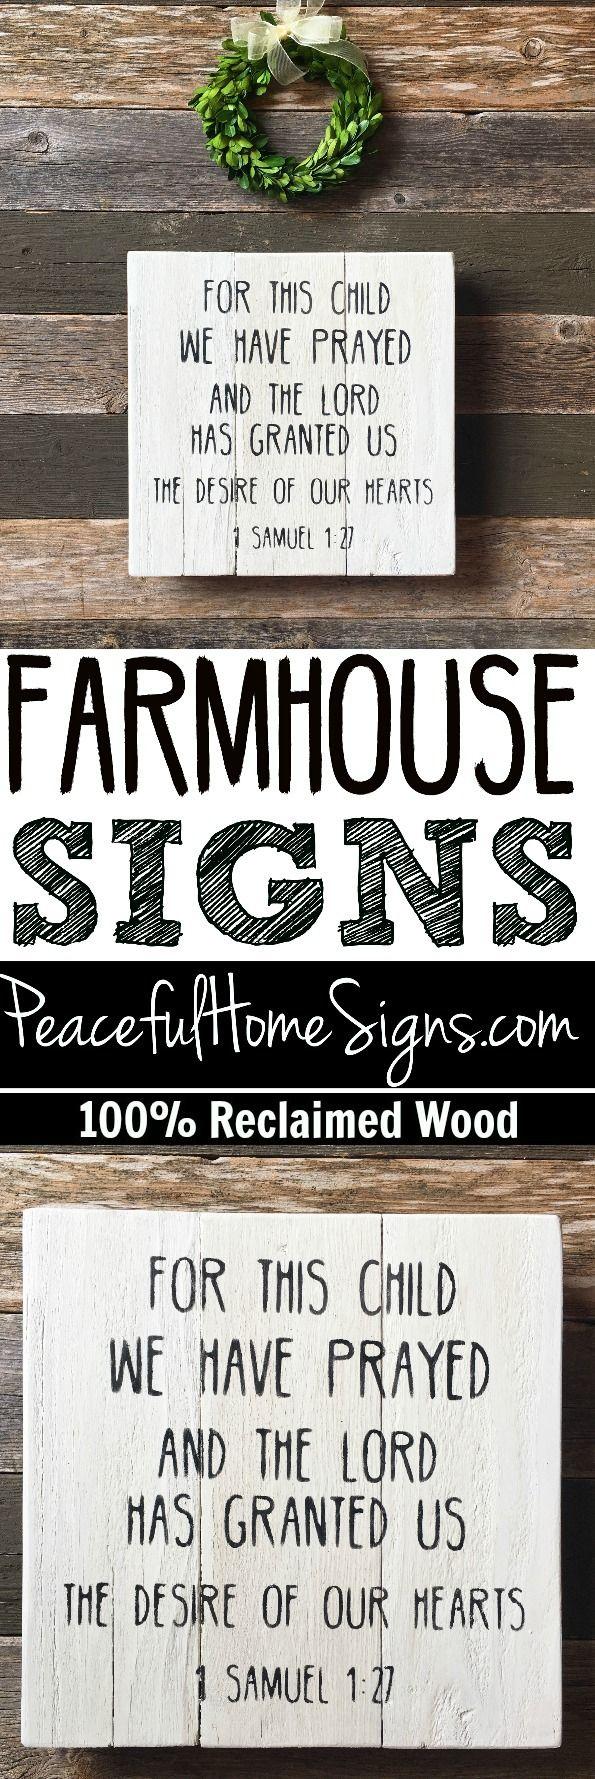 For this child I have prayed sign | Nursery sign | Farmhouse nursery sign | 1 Samuel 1:27 sign | Reclaimed wood nursery | Bible verse sign | Scripture nursery sign